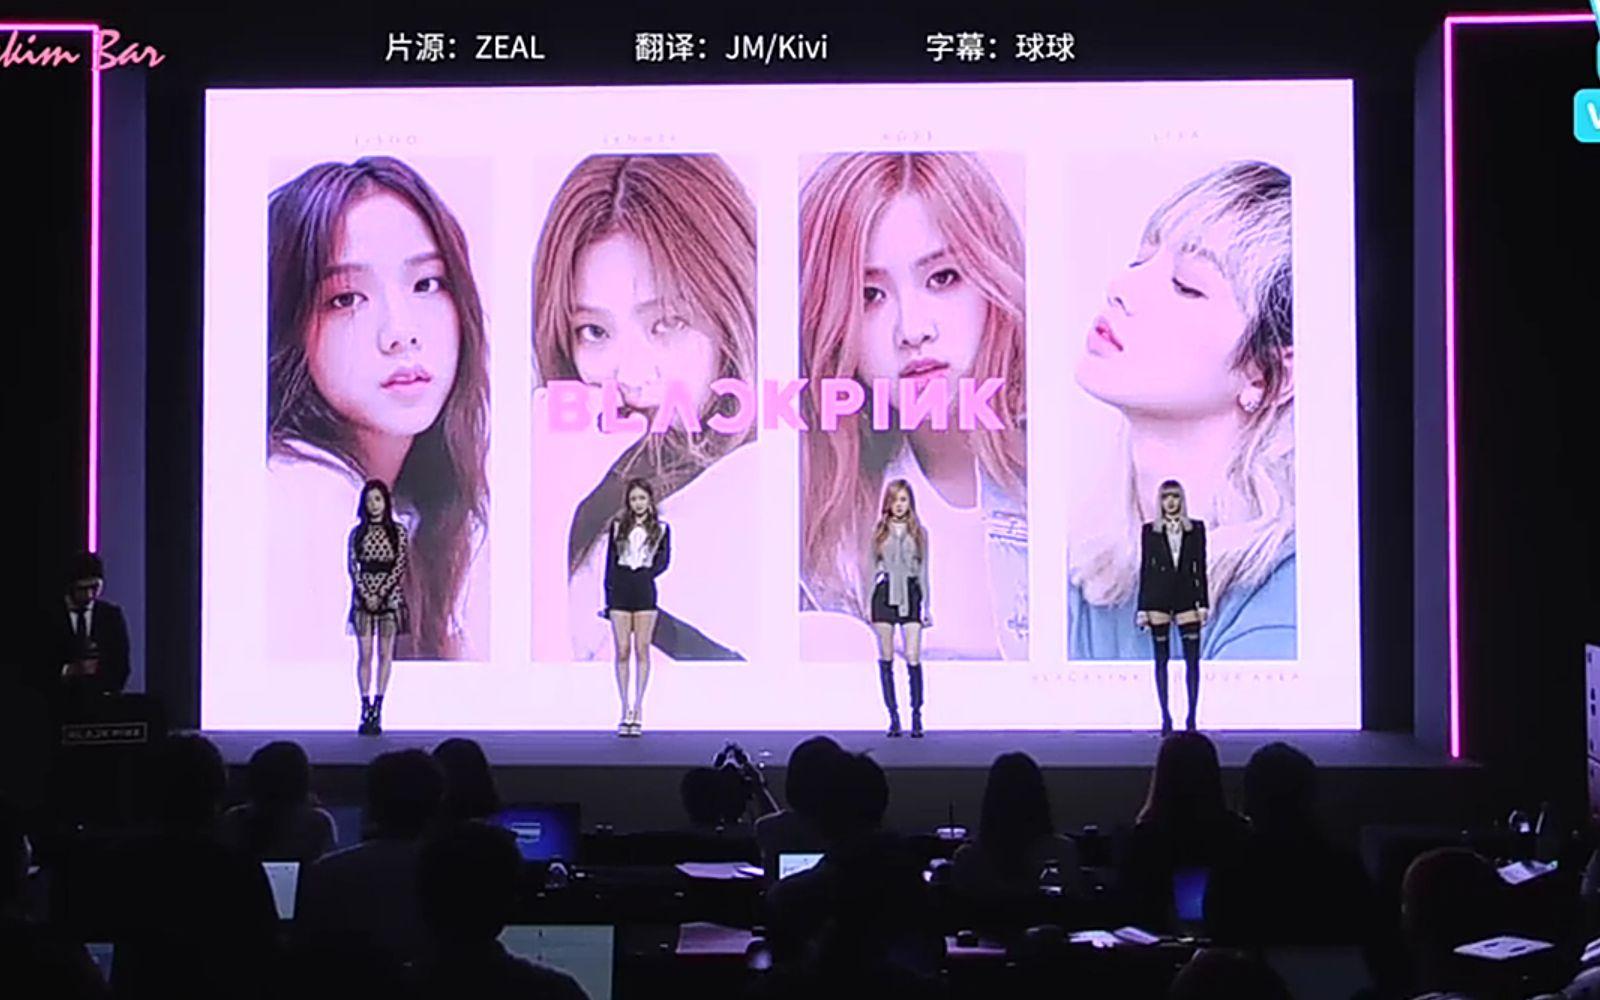 BLACKPINK 出道Showcase 中文字幕(Jennie吧)-YG Family_嗶哩嗶哩 (゜-゜)つロ 干杯~-bilibili